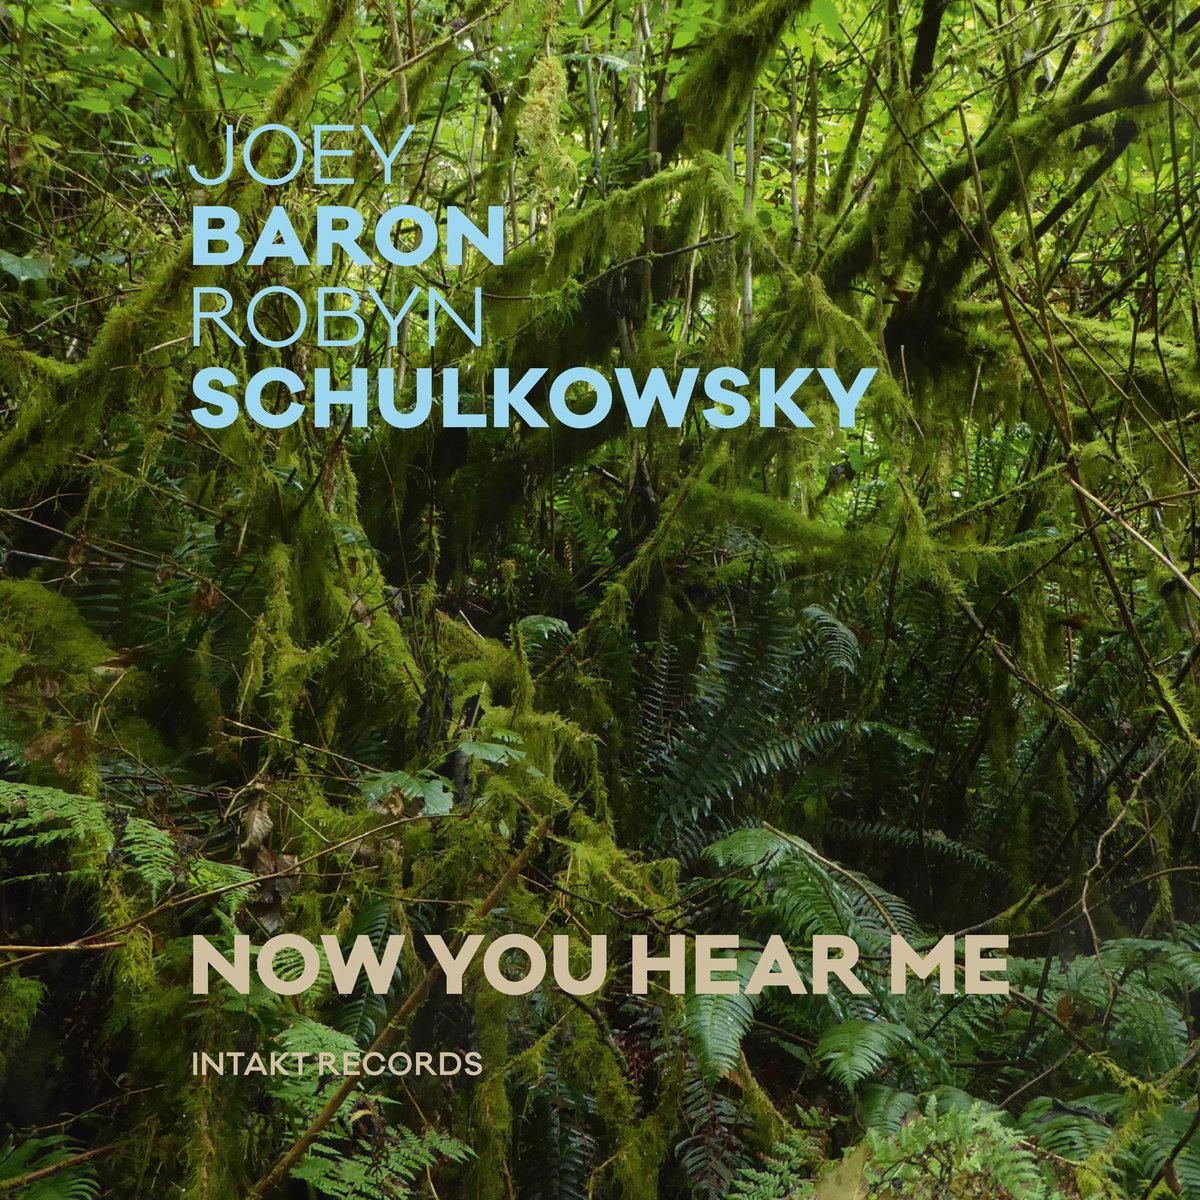 Joey Baron, Robyn Schulkowsky<br/>Now You Hear Me<br/>Intakt, 2018